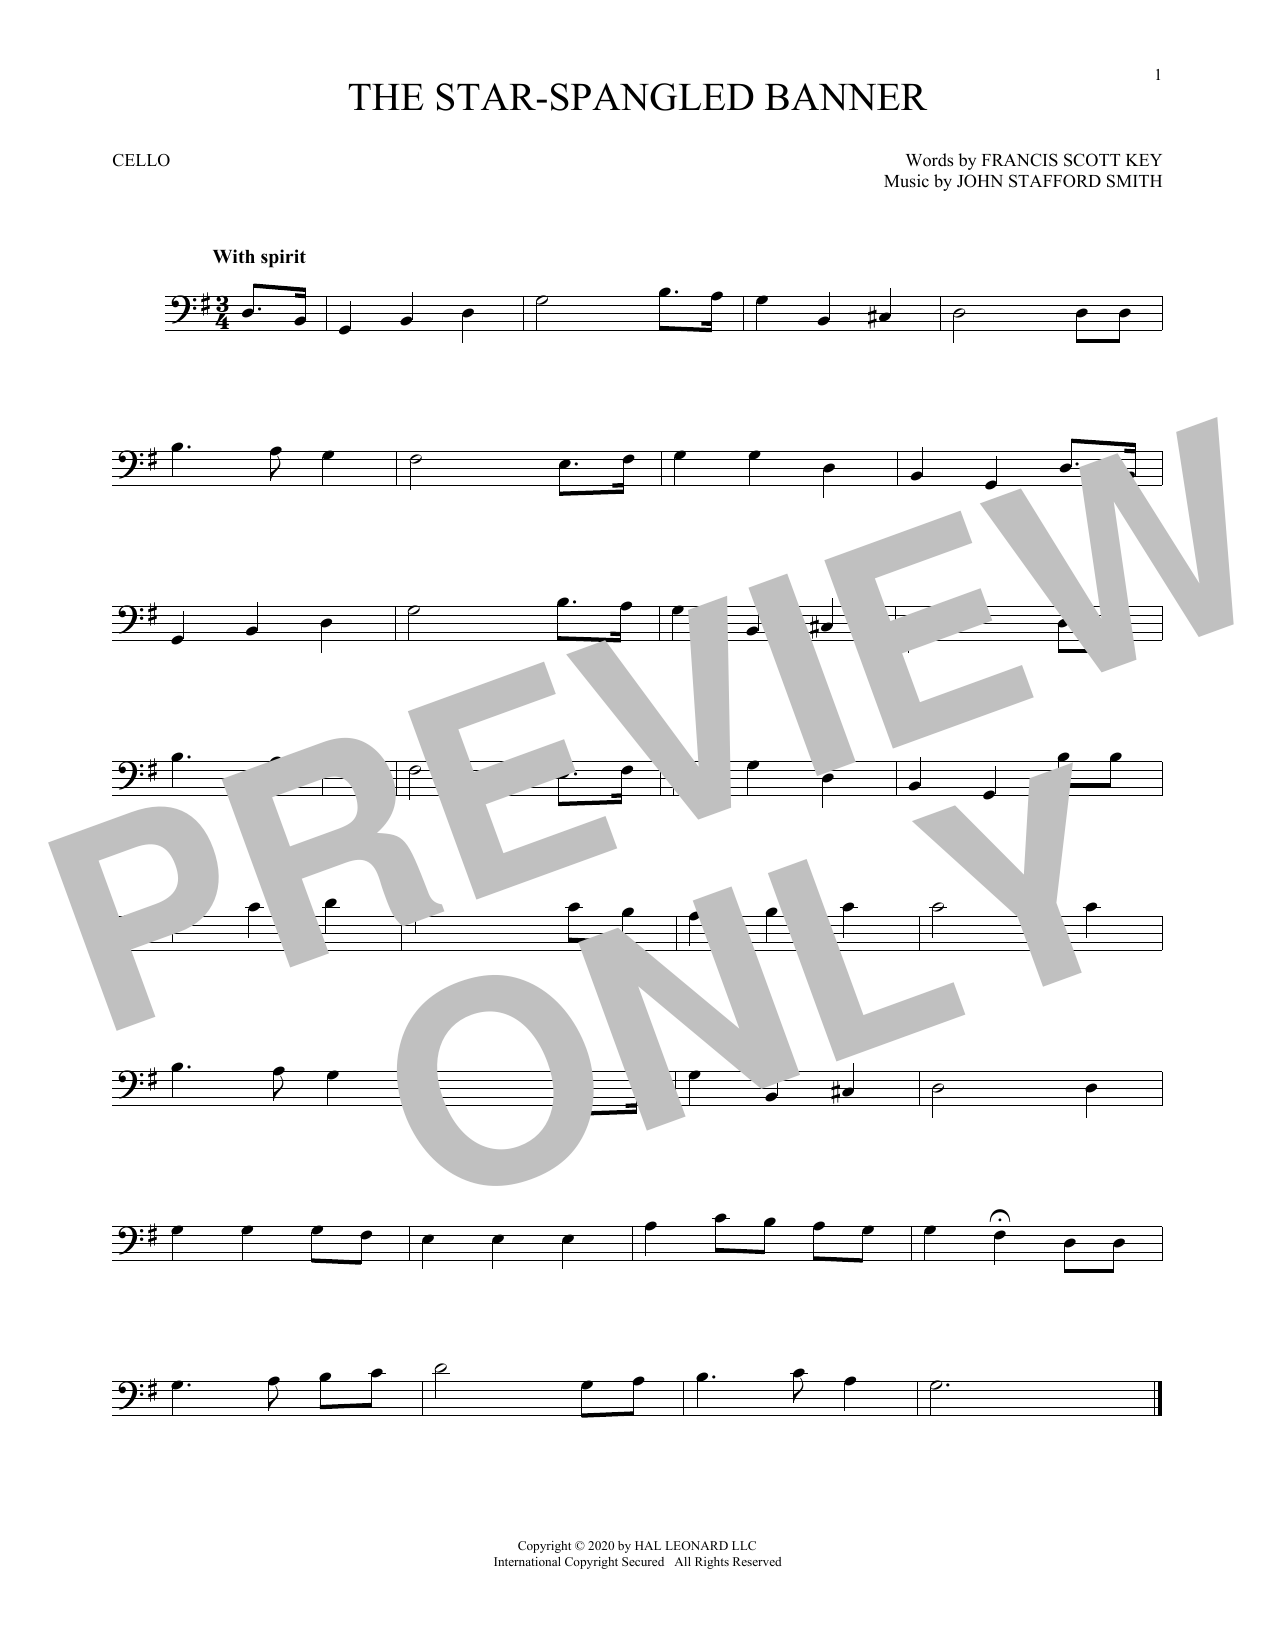 The Star-Spangled Banner (Cello Solo)